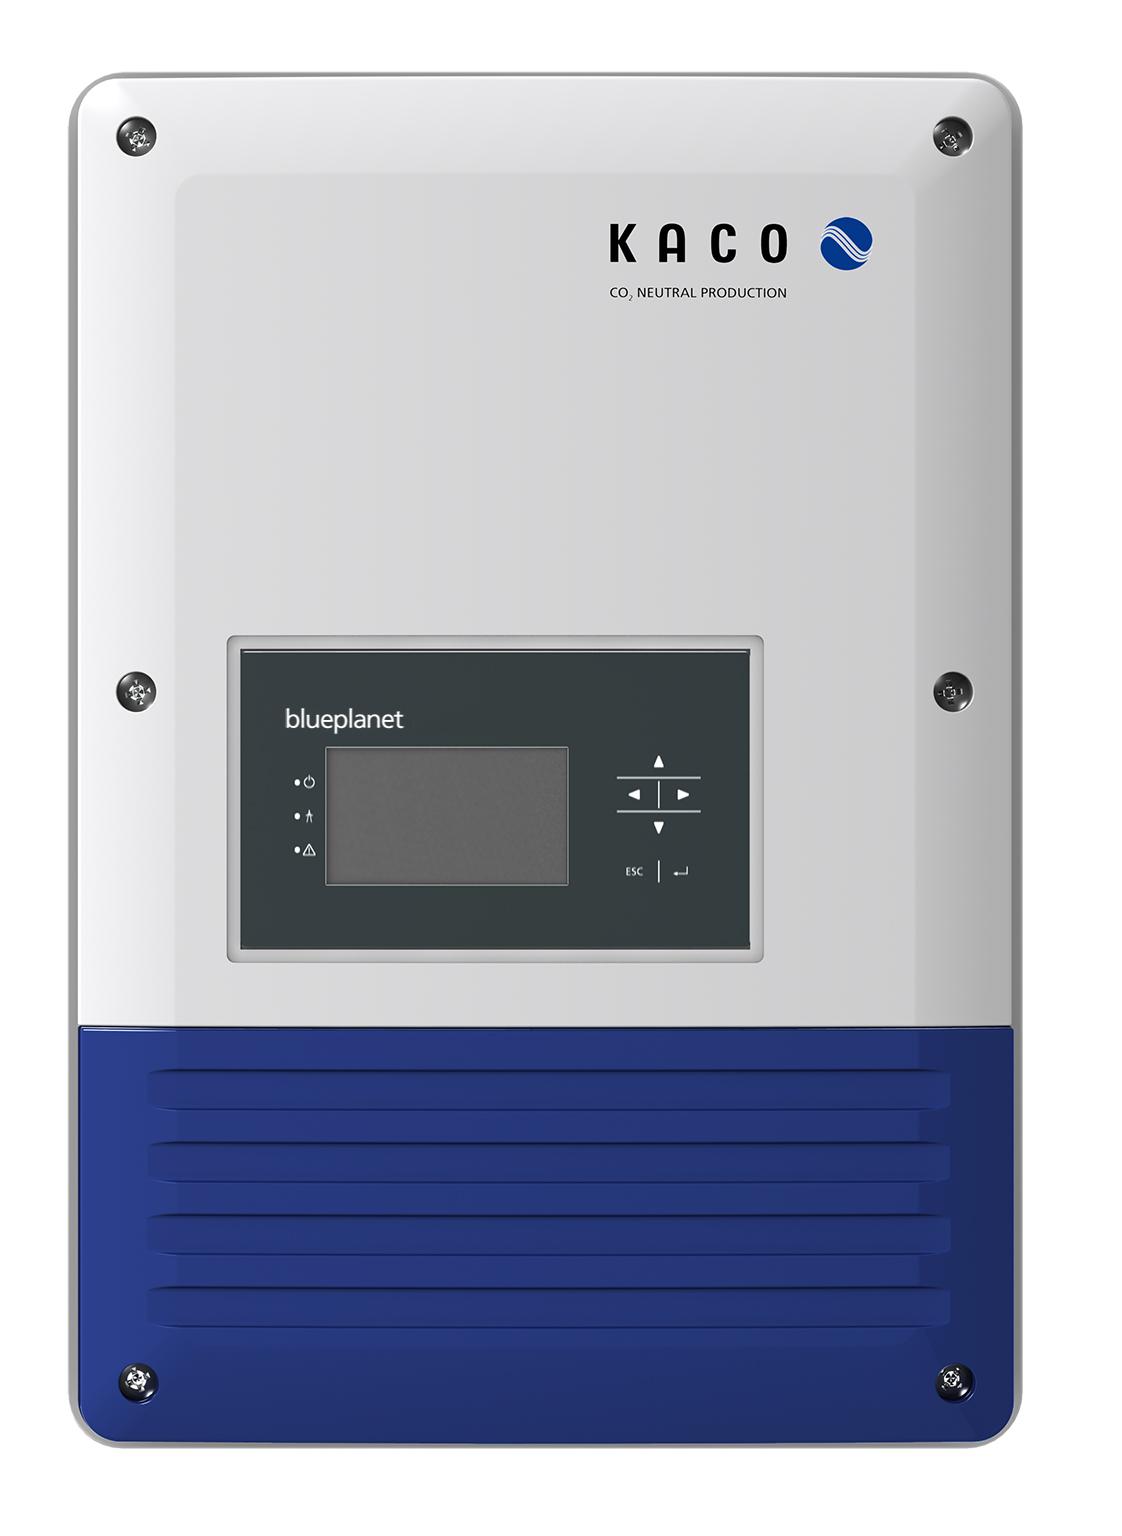 1 Stk Kaco blueplanet 9.0 TL3 3ph IP65 2 MPP-Tracker  PVI50090--